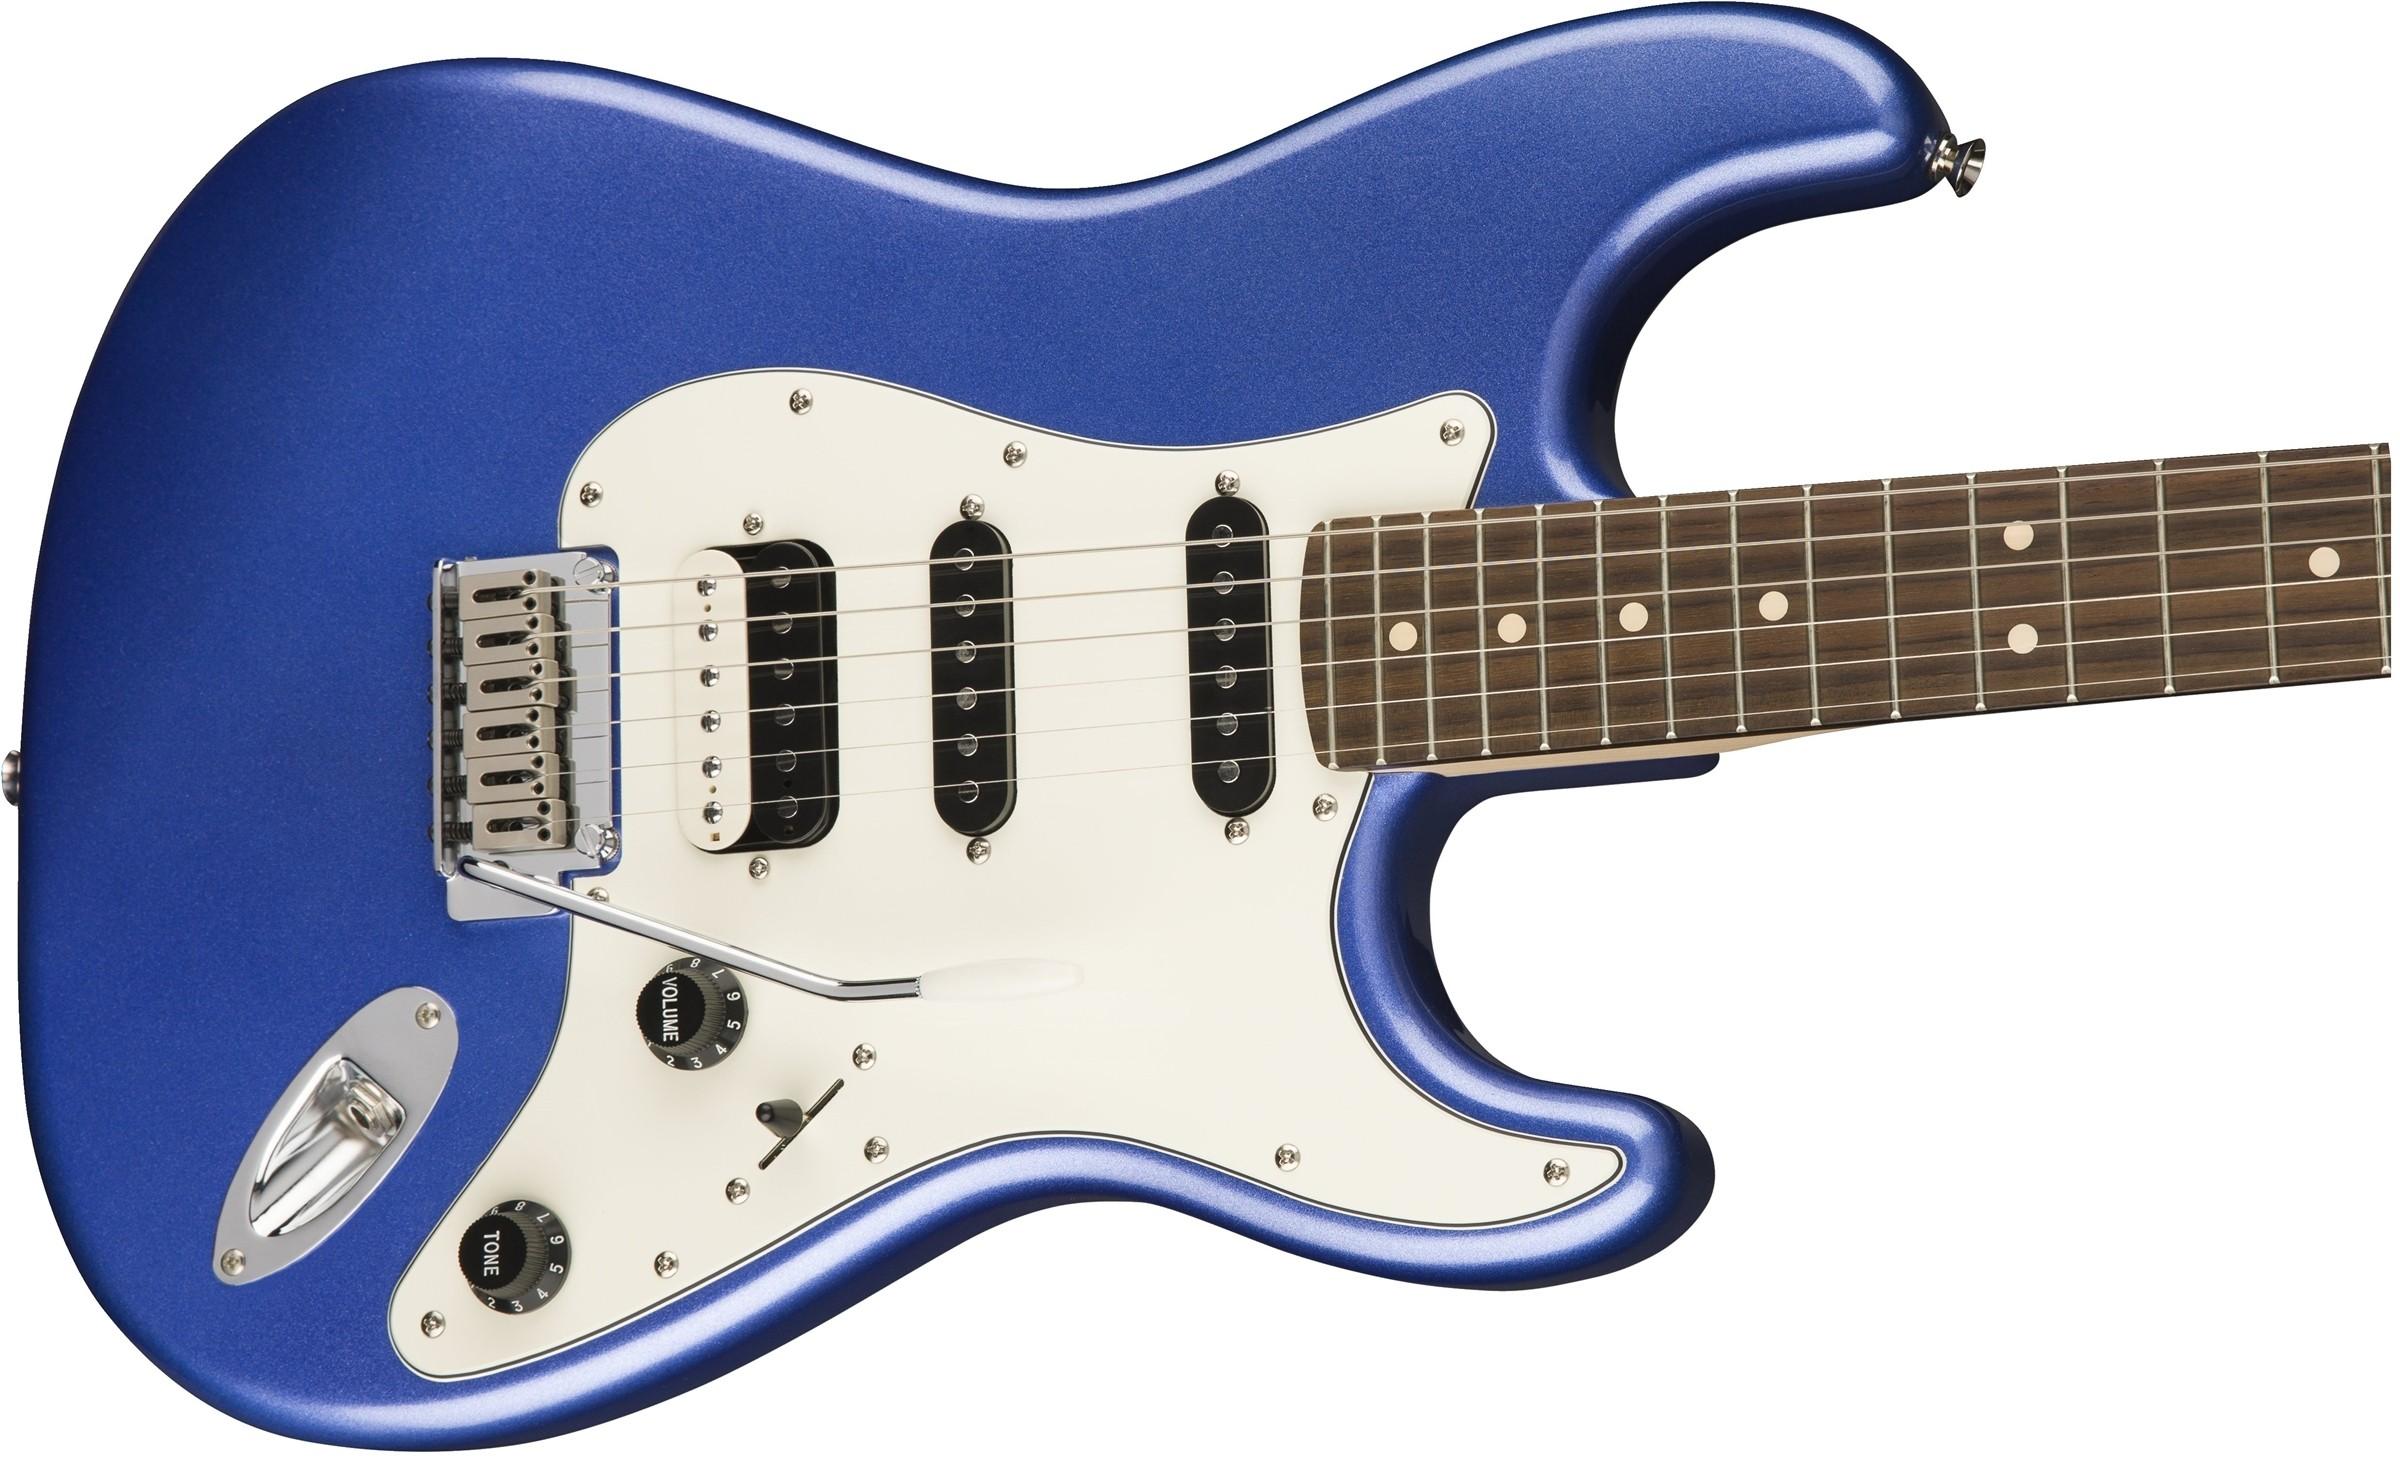 squier contemporary stratocaster hss ocean blue vintage modern guitars. Black Bedroom Furniture Sets. Home Design Ideas